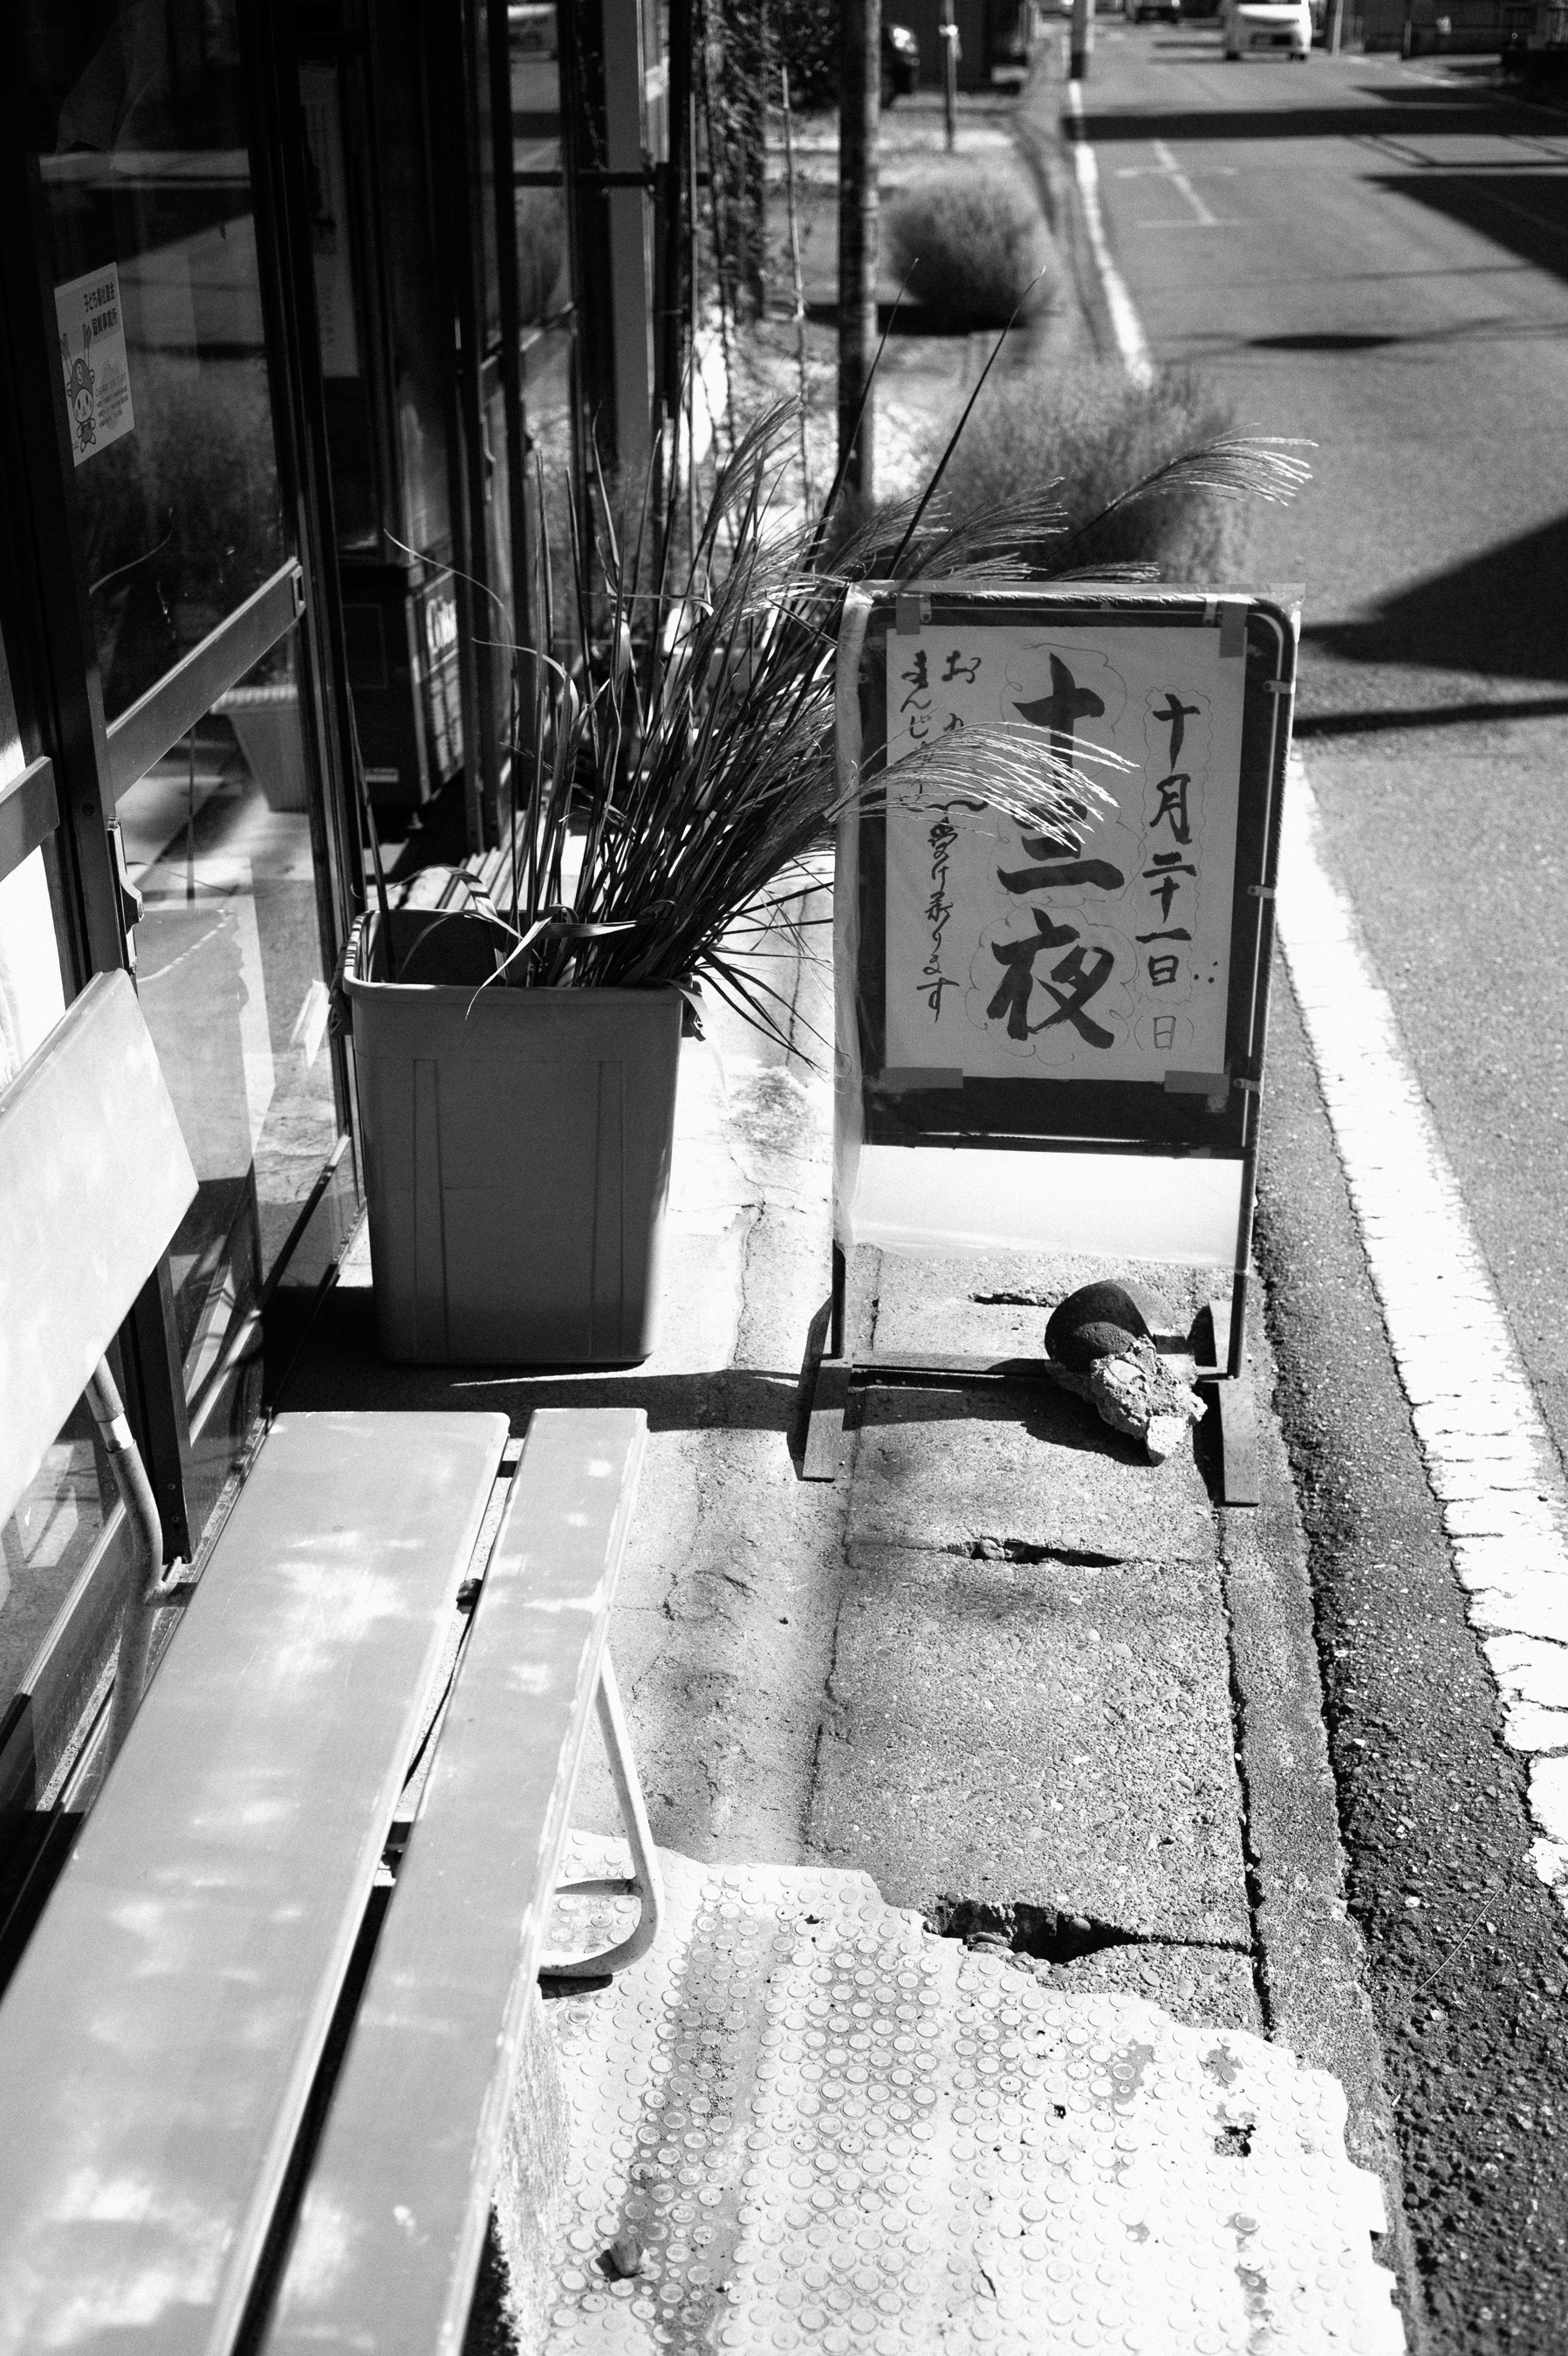 f:id:aoyama-takuro:20181021220828j:plain